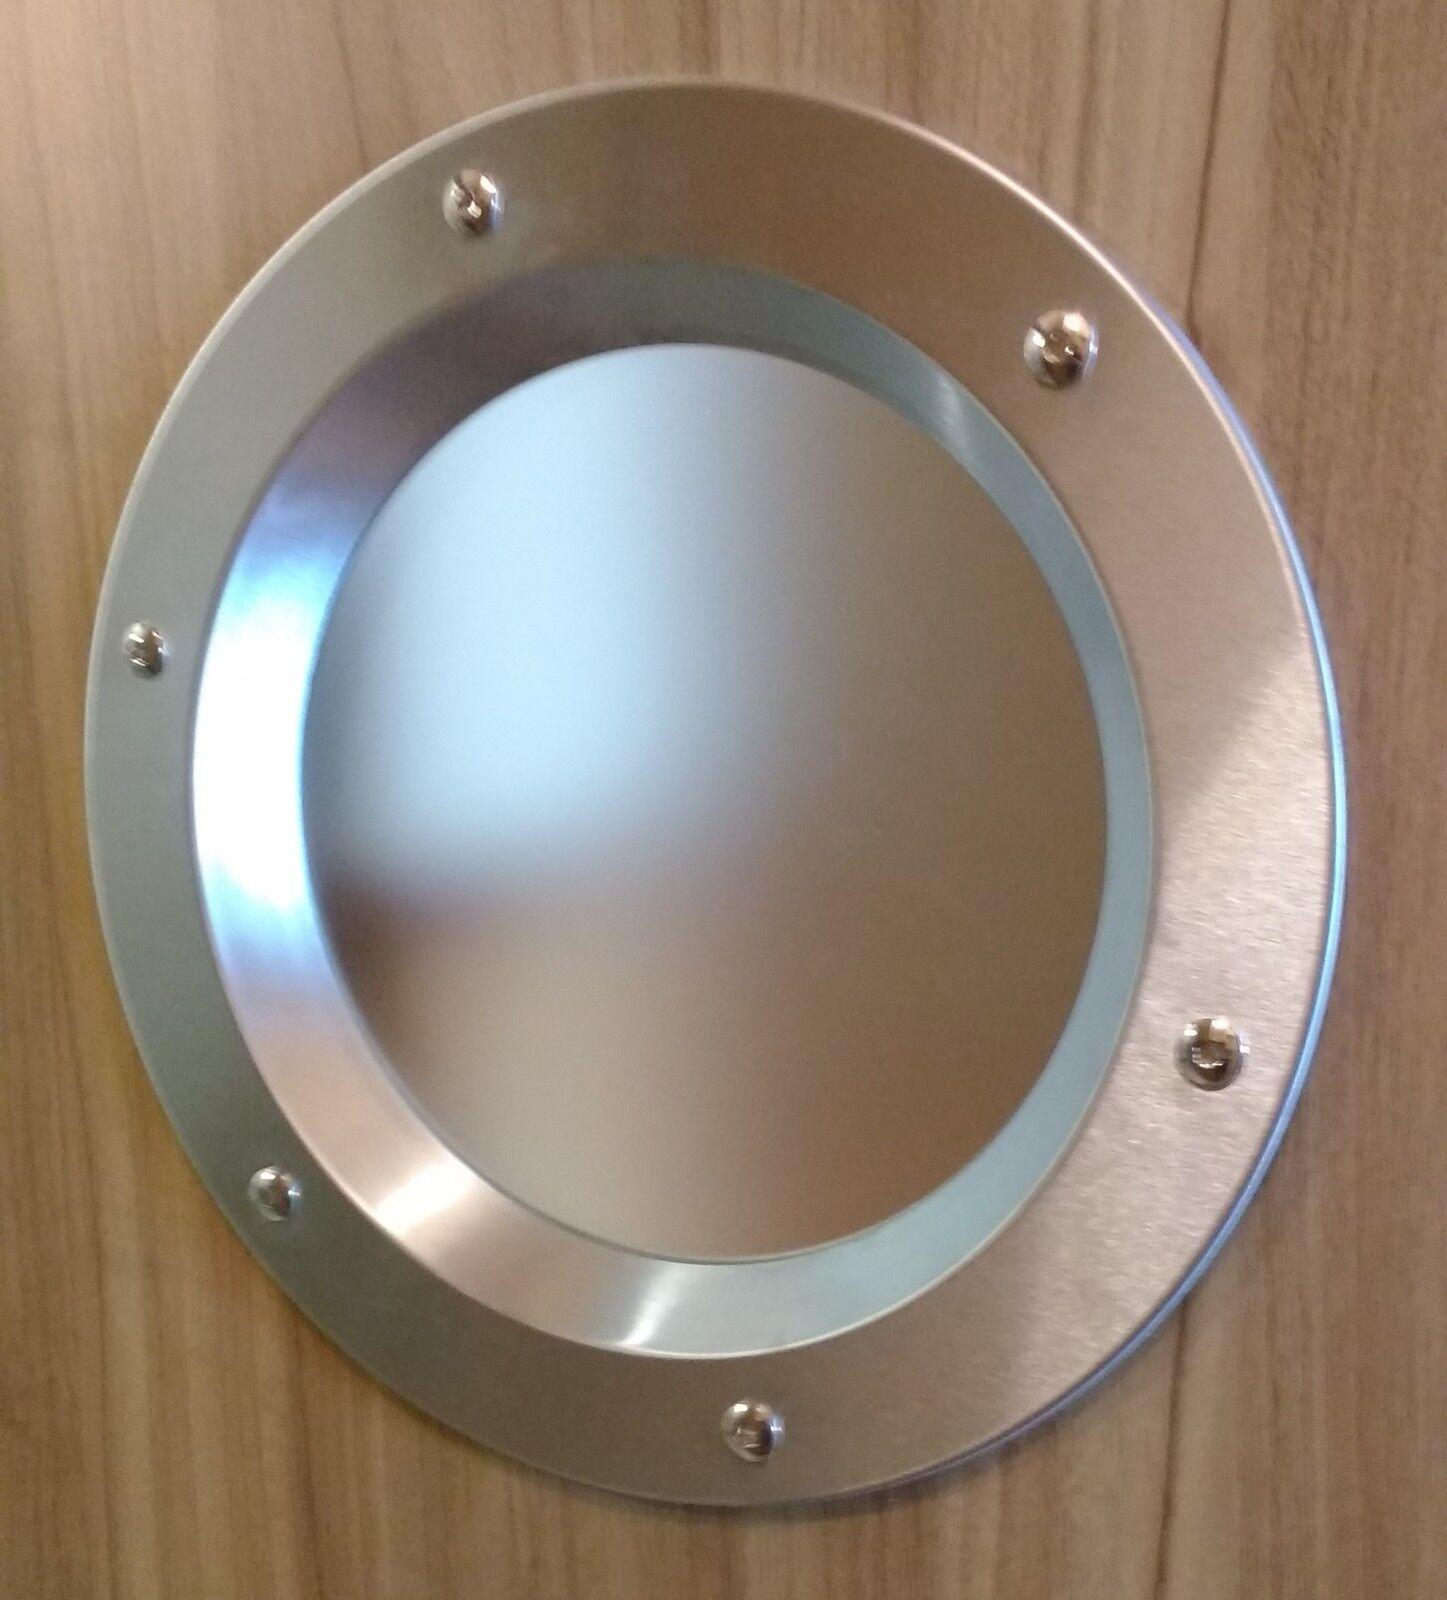 PORTHOLE FOR DOORS 350 mm